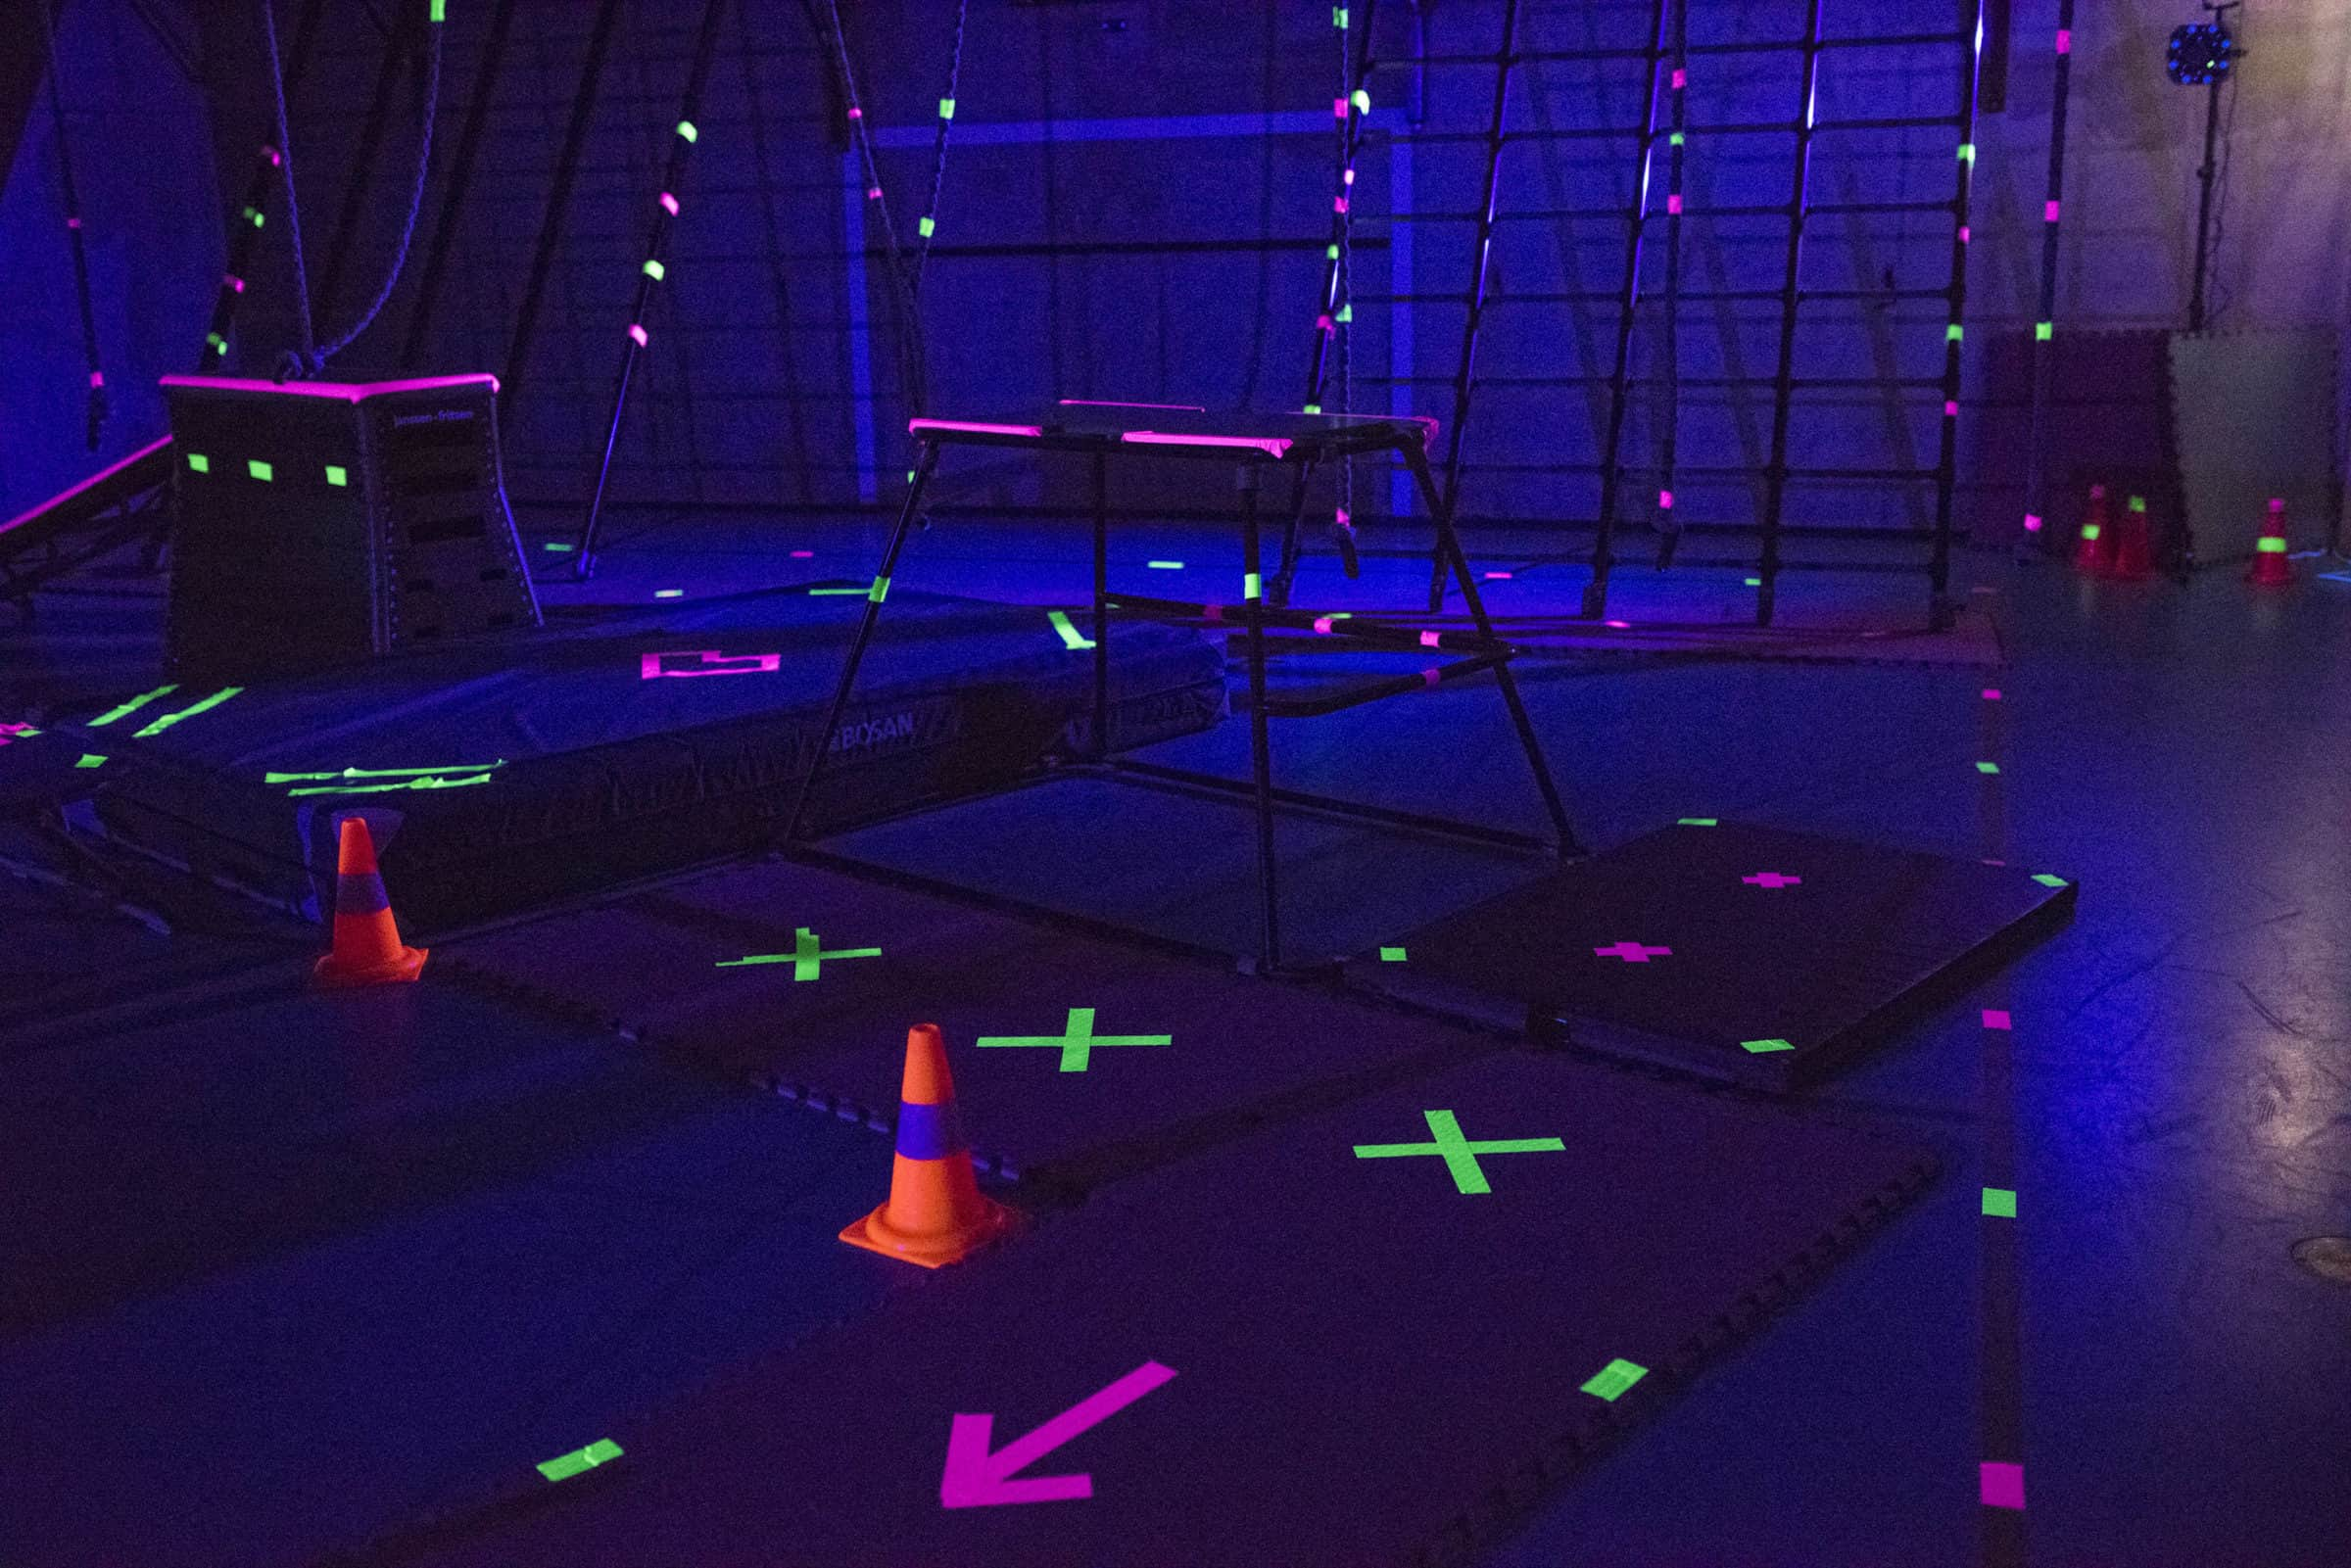 APENKOOI_4 - sportief, gym, kind, spelletjes, blacklight